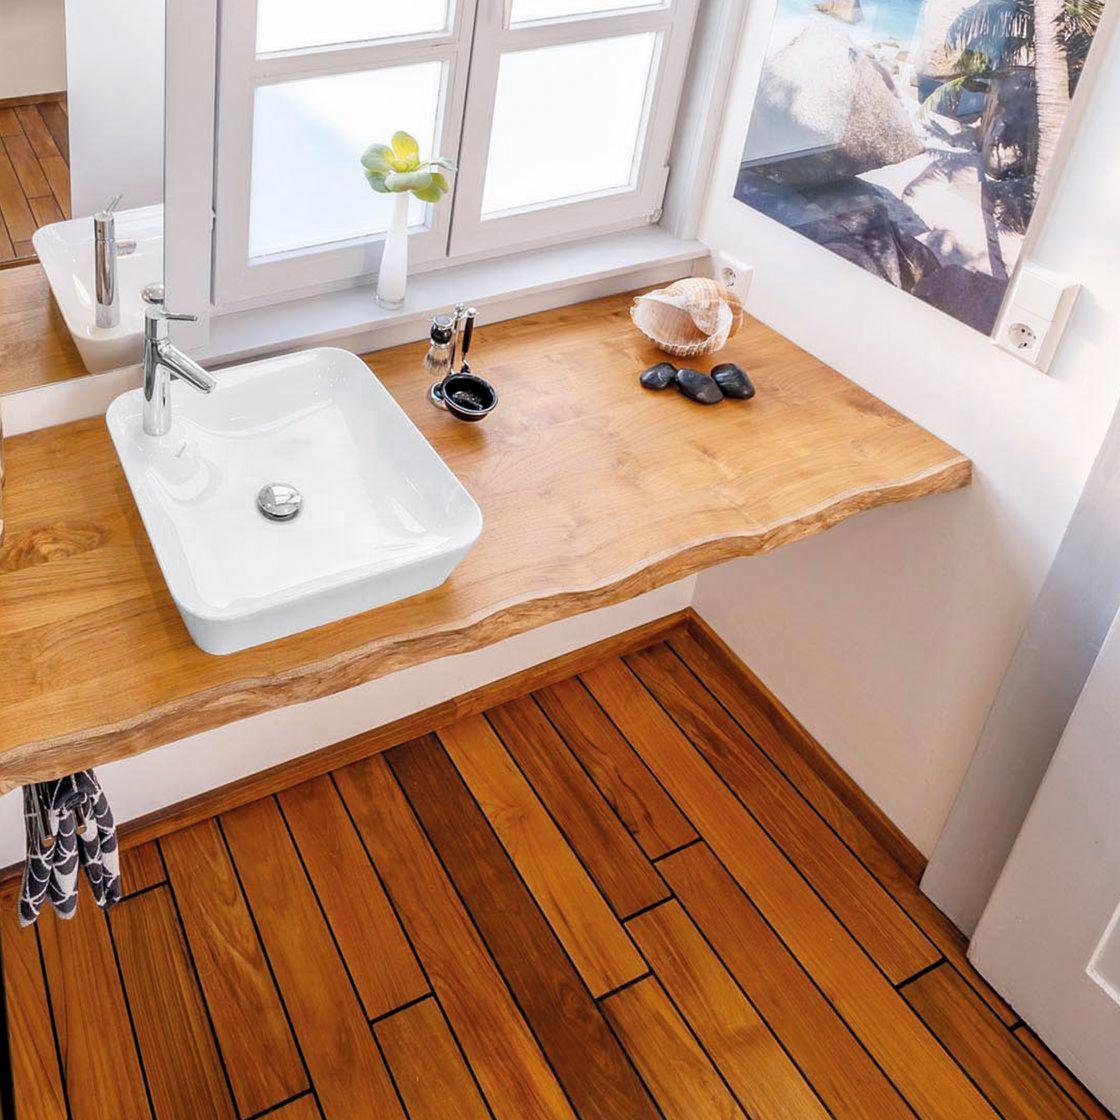 Waschplatz mit Holzelementen